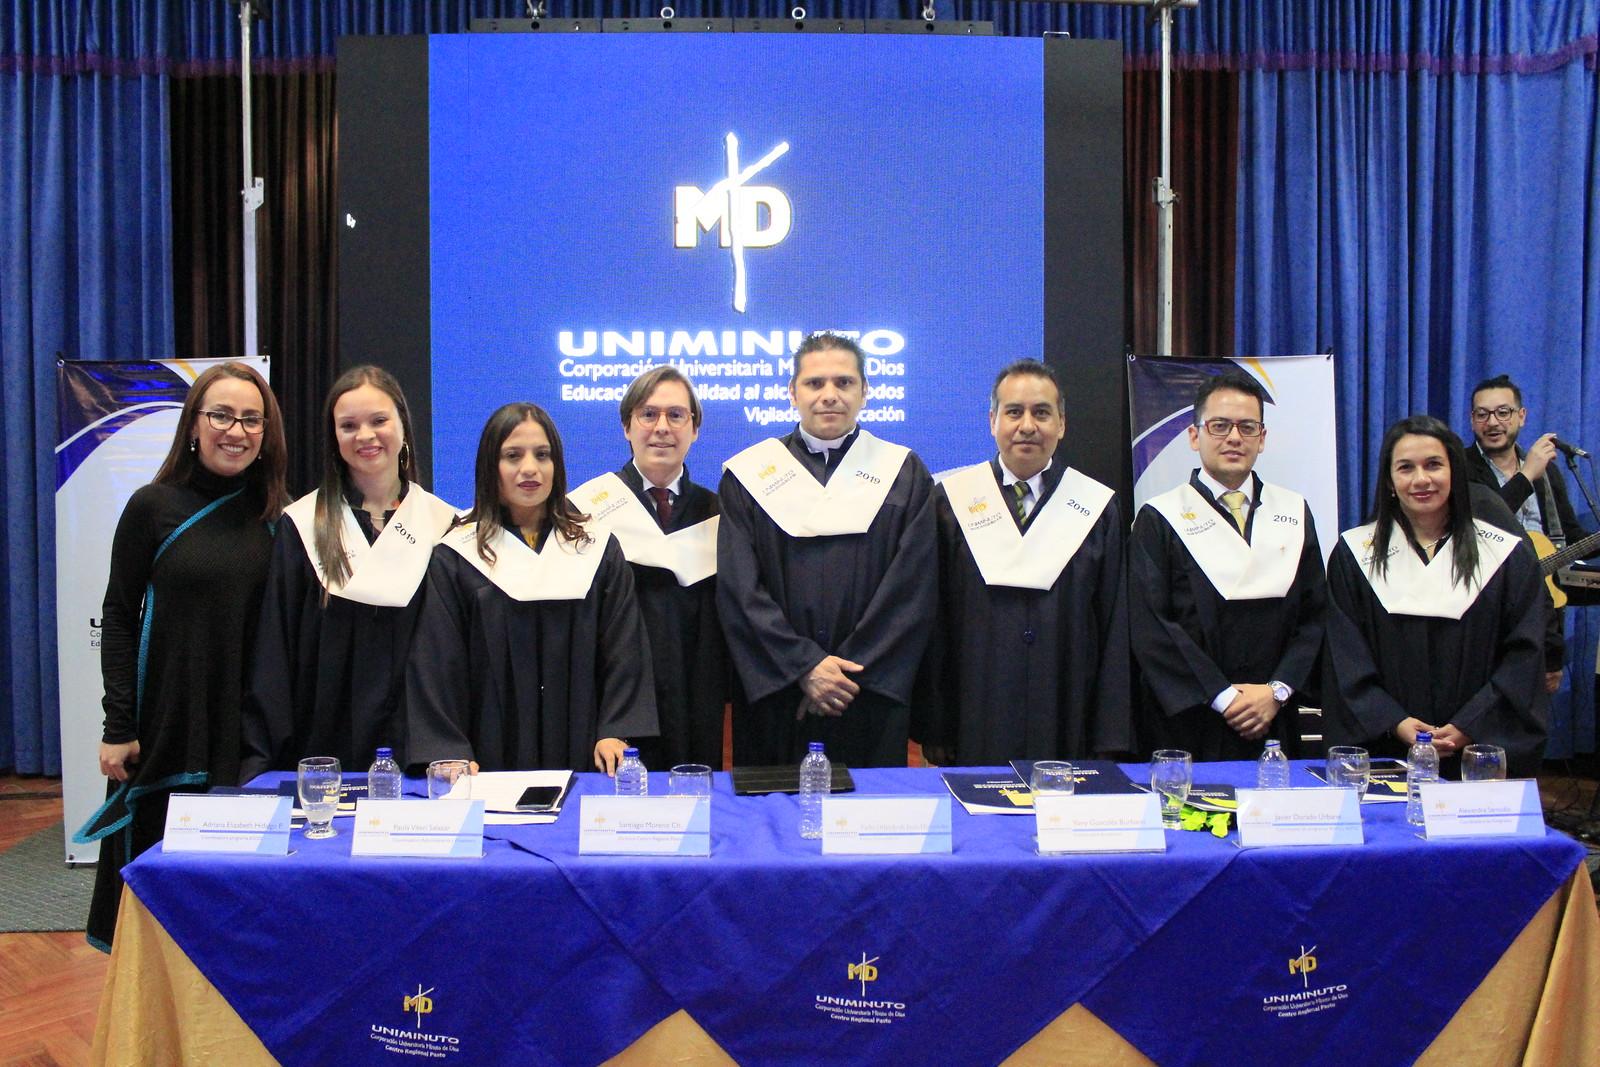 Grados UNIMINUTO Centro Regional Pasto